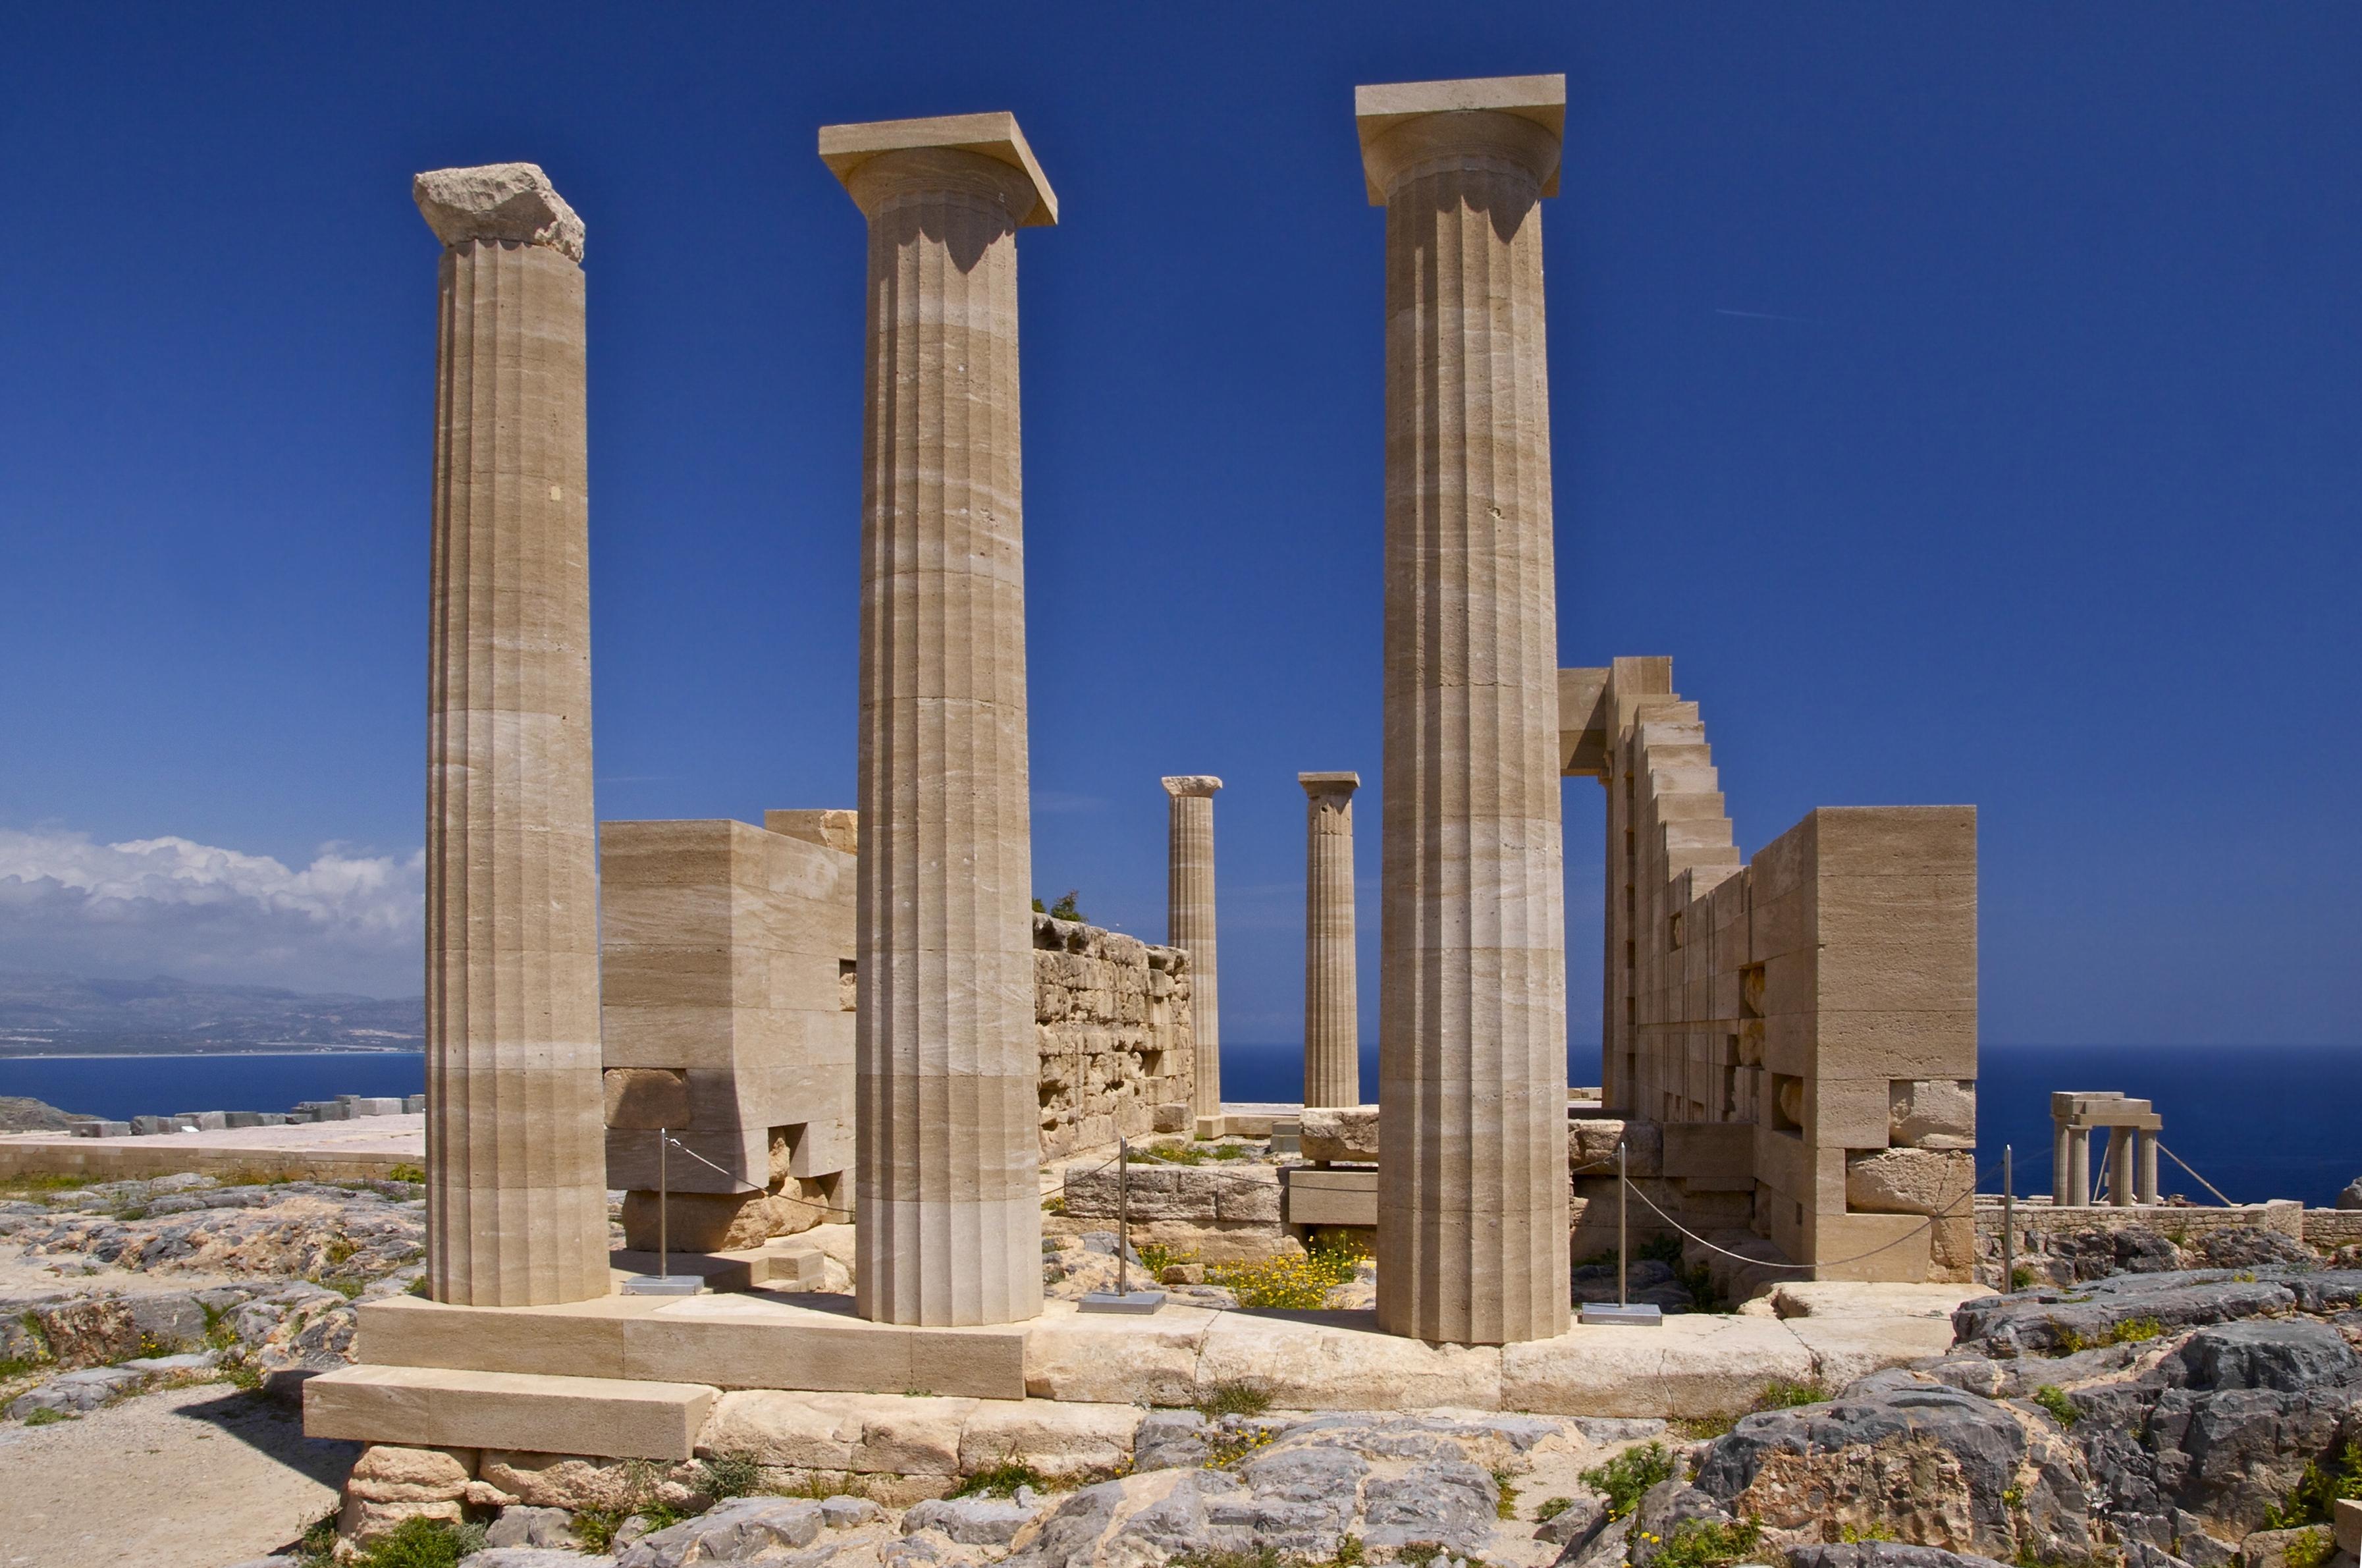 File:Acropolis Lindos Rhodes 1.jpg - Wikimedia Commons